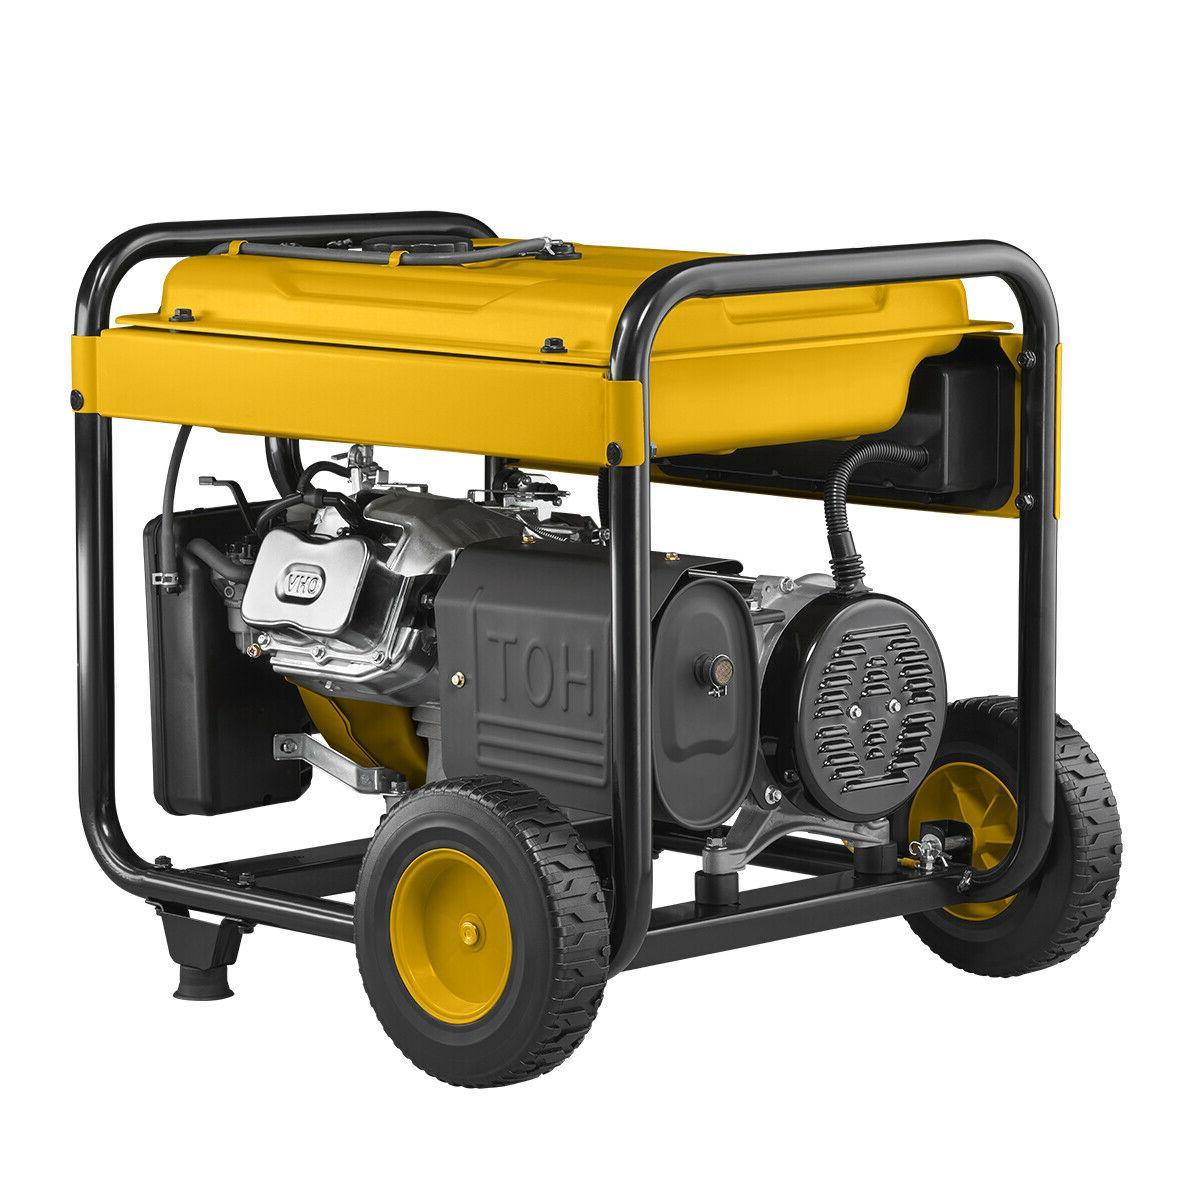 DeWALT - Watt Portable Generator | 7125 Surge Watts 49